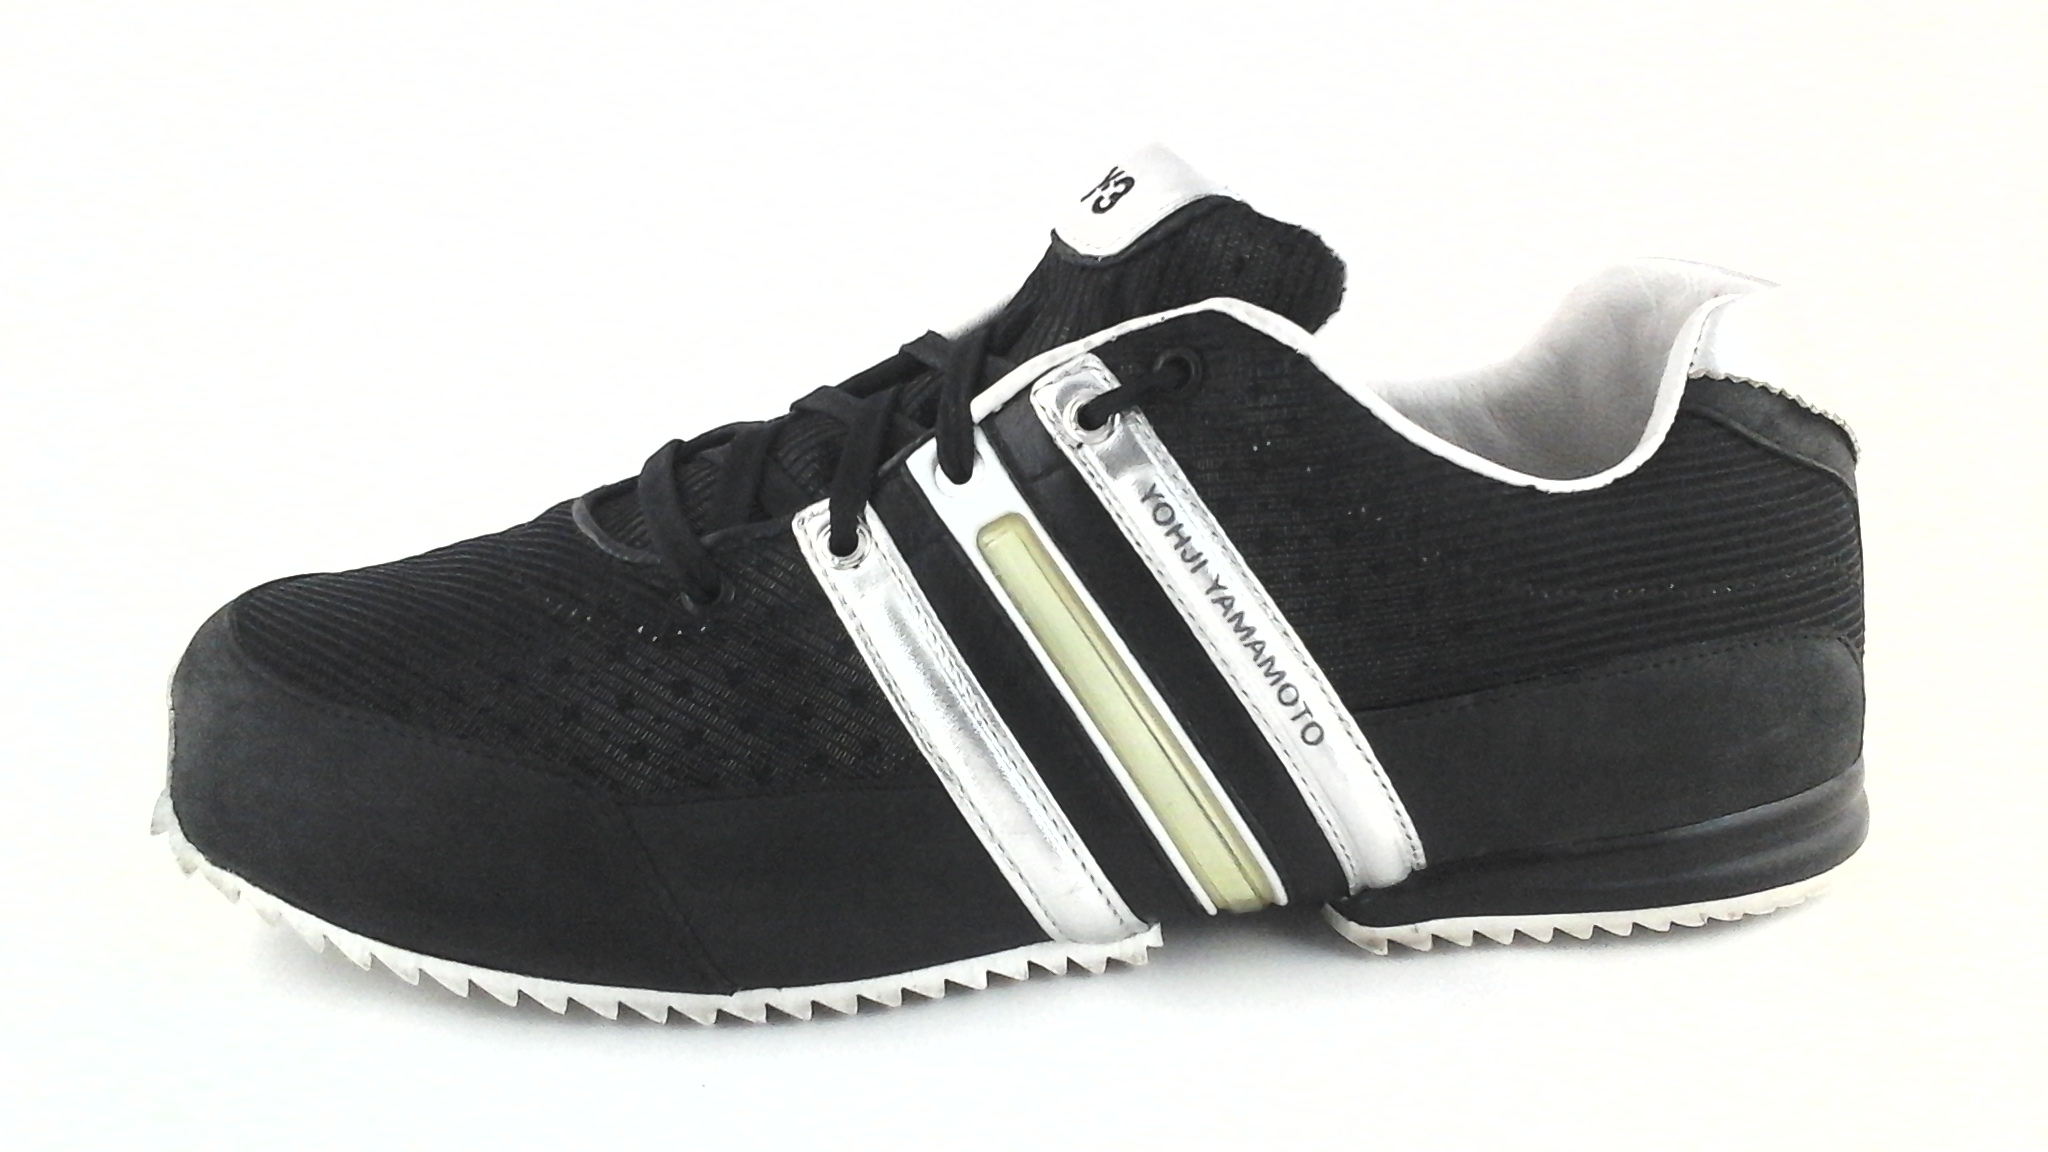 c370c7c98ed9e ADIDAS Y-3 Yohji Yamamoto Sprint Black Silver SNEAKERS Shoes US 8 EU 41 1 3   320